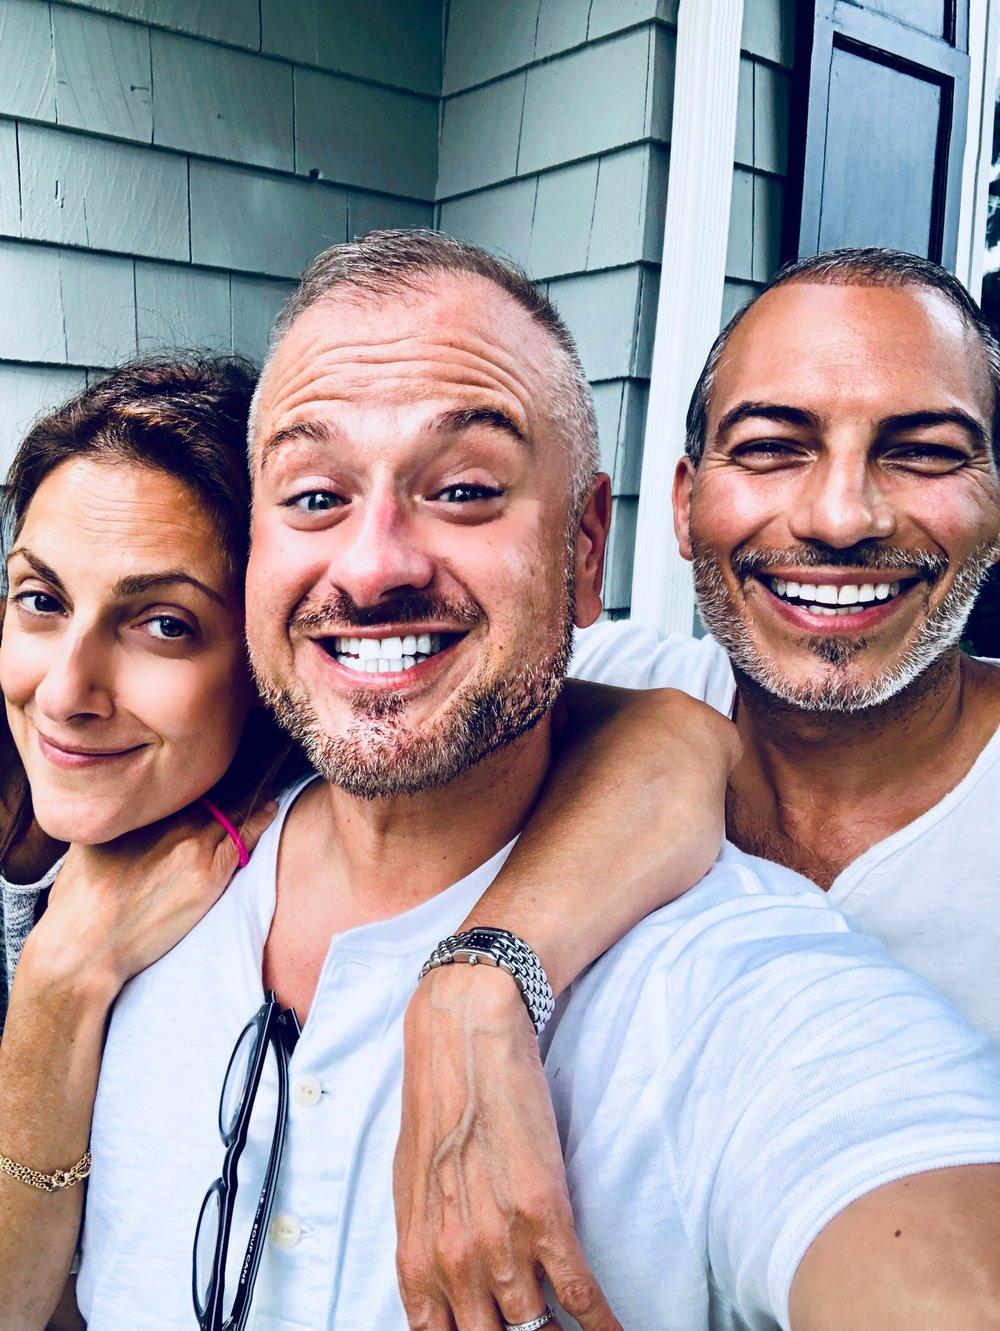 My two wonderful cousins, Lili and Ali,Bridgehampton, New York July 22, 2018